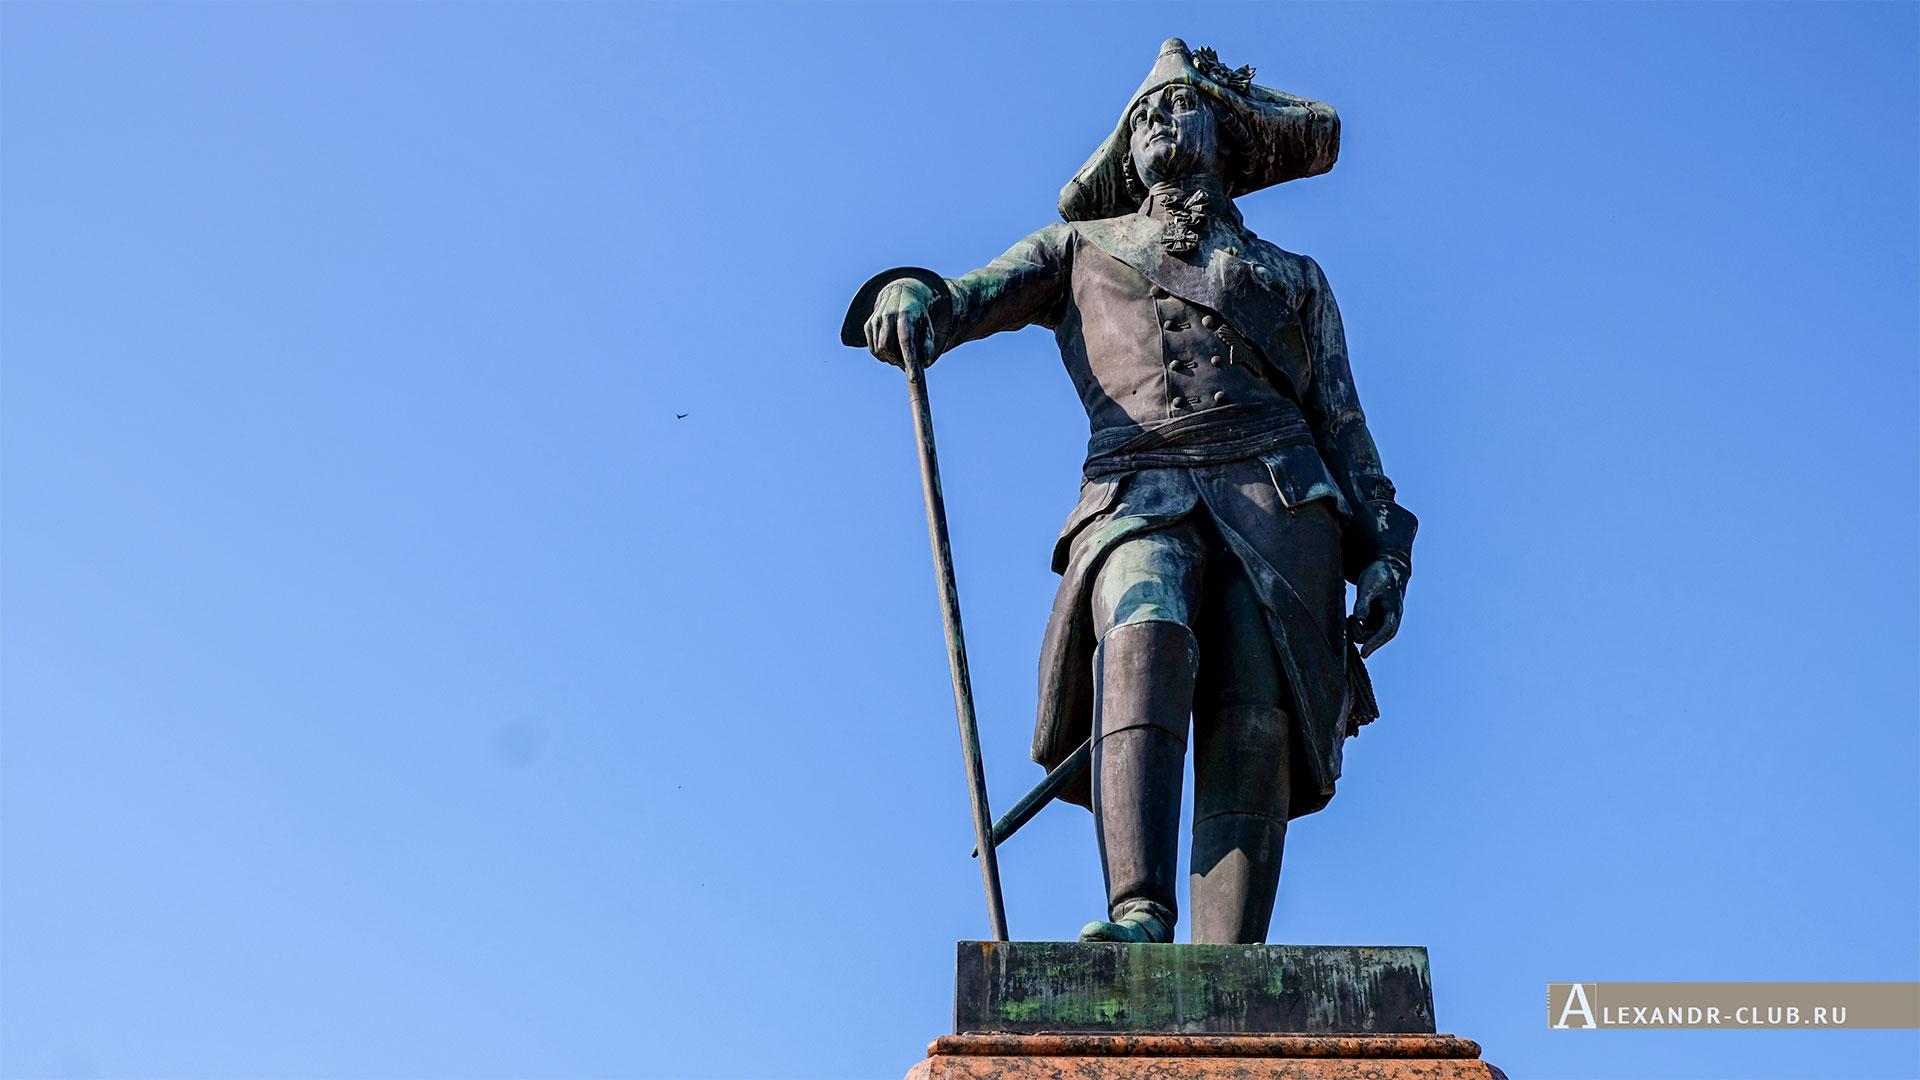 Гатчина, лето, Памятник Павлу I